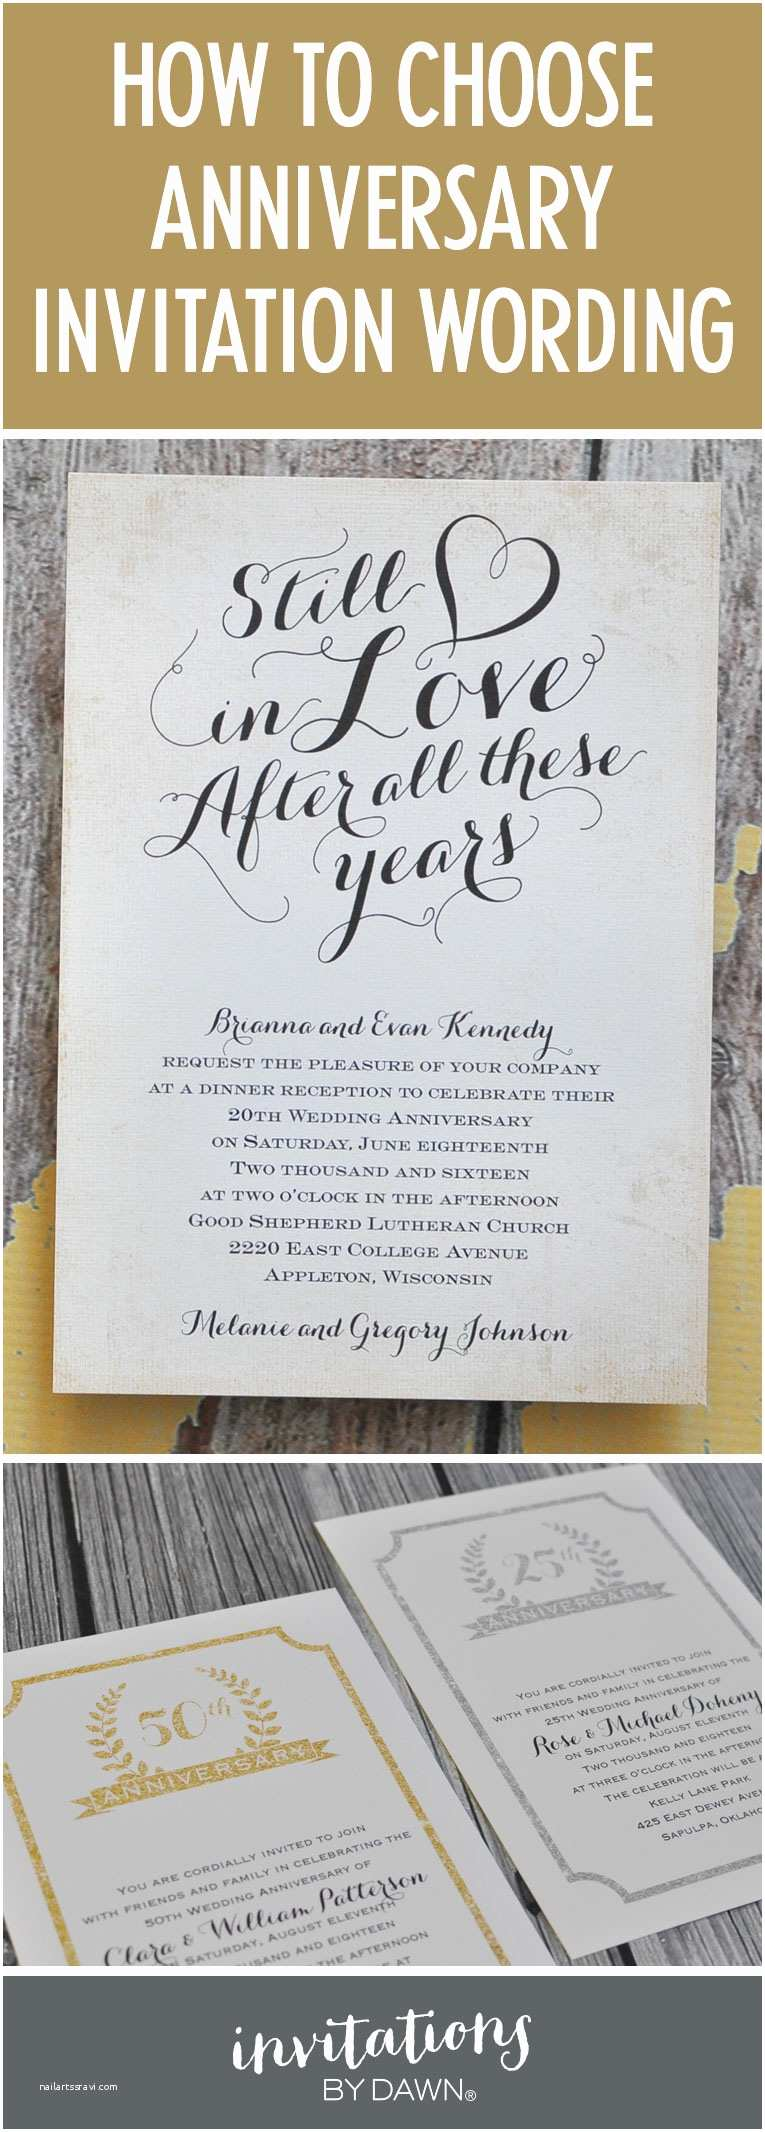 Wedding Celebration Invitations Wedding Anniversary Party Invitation Wording Yaseen for